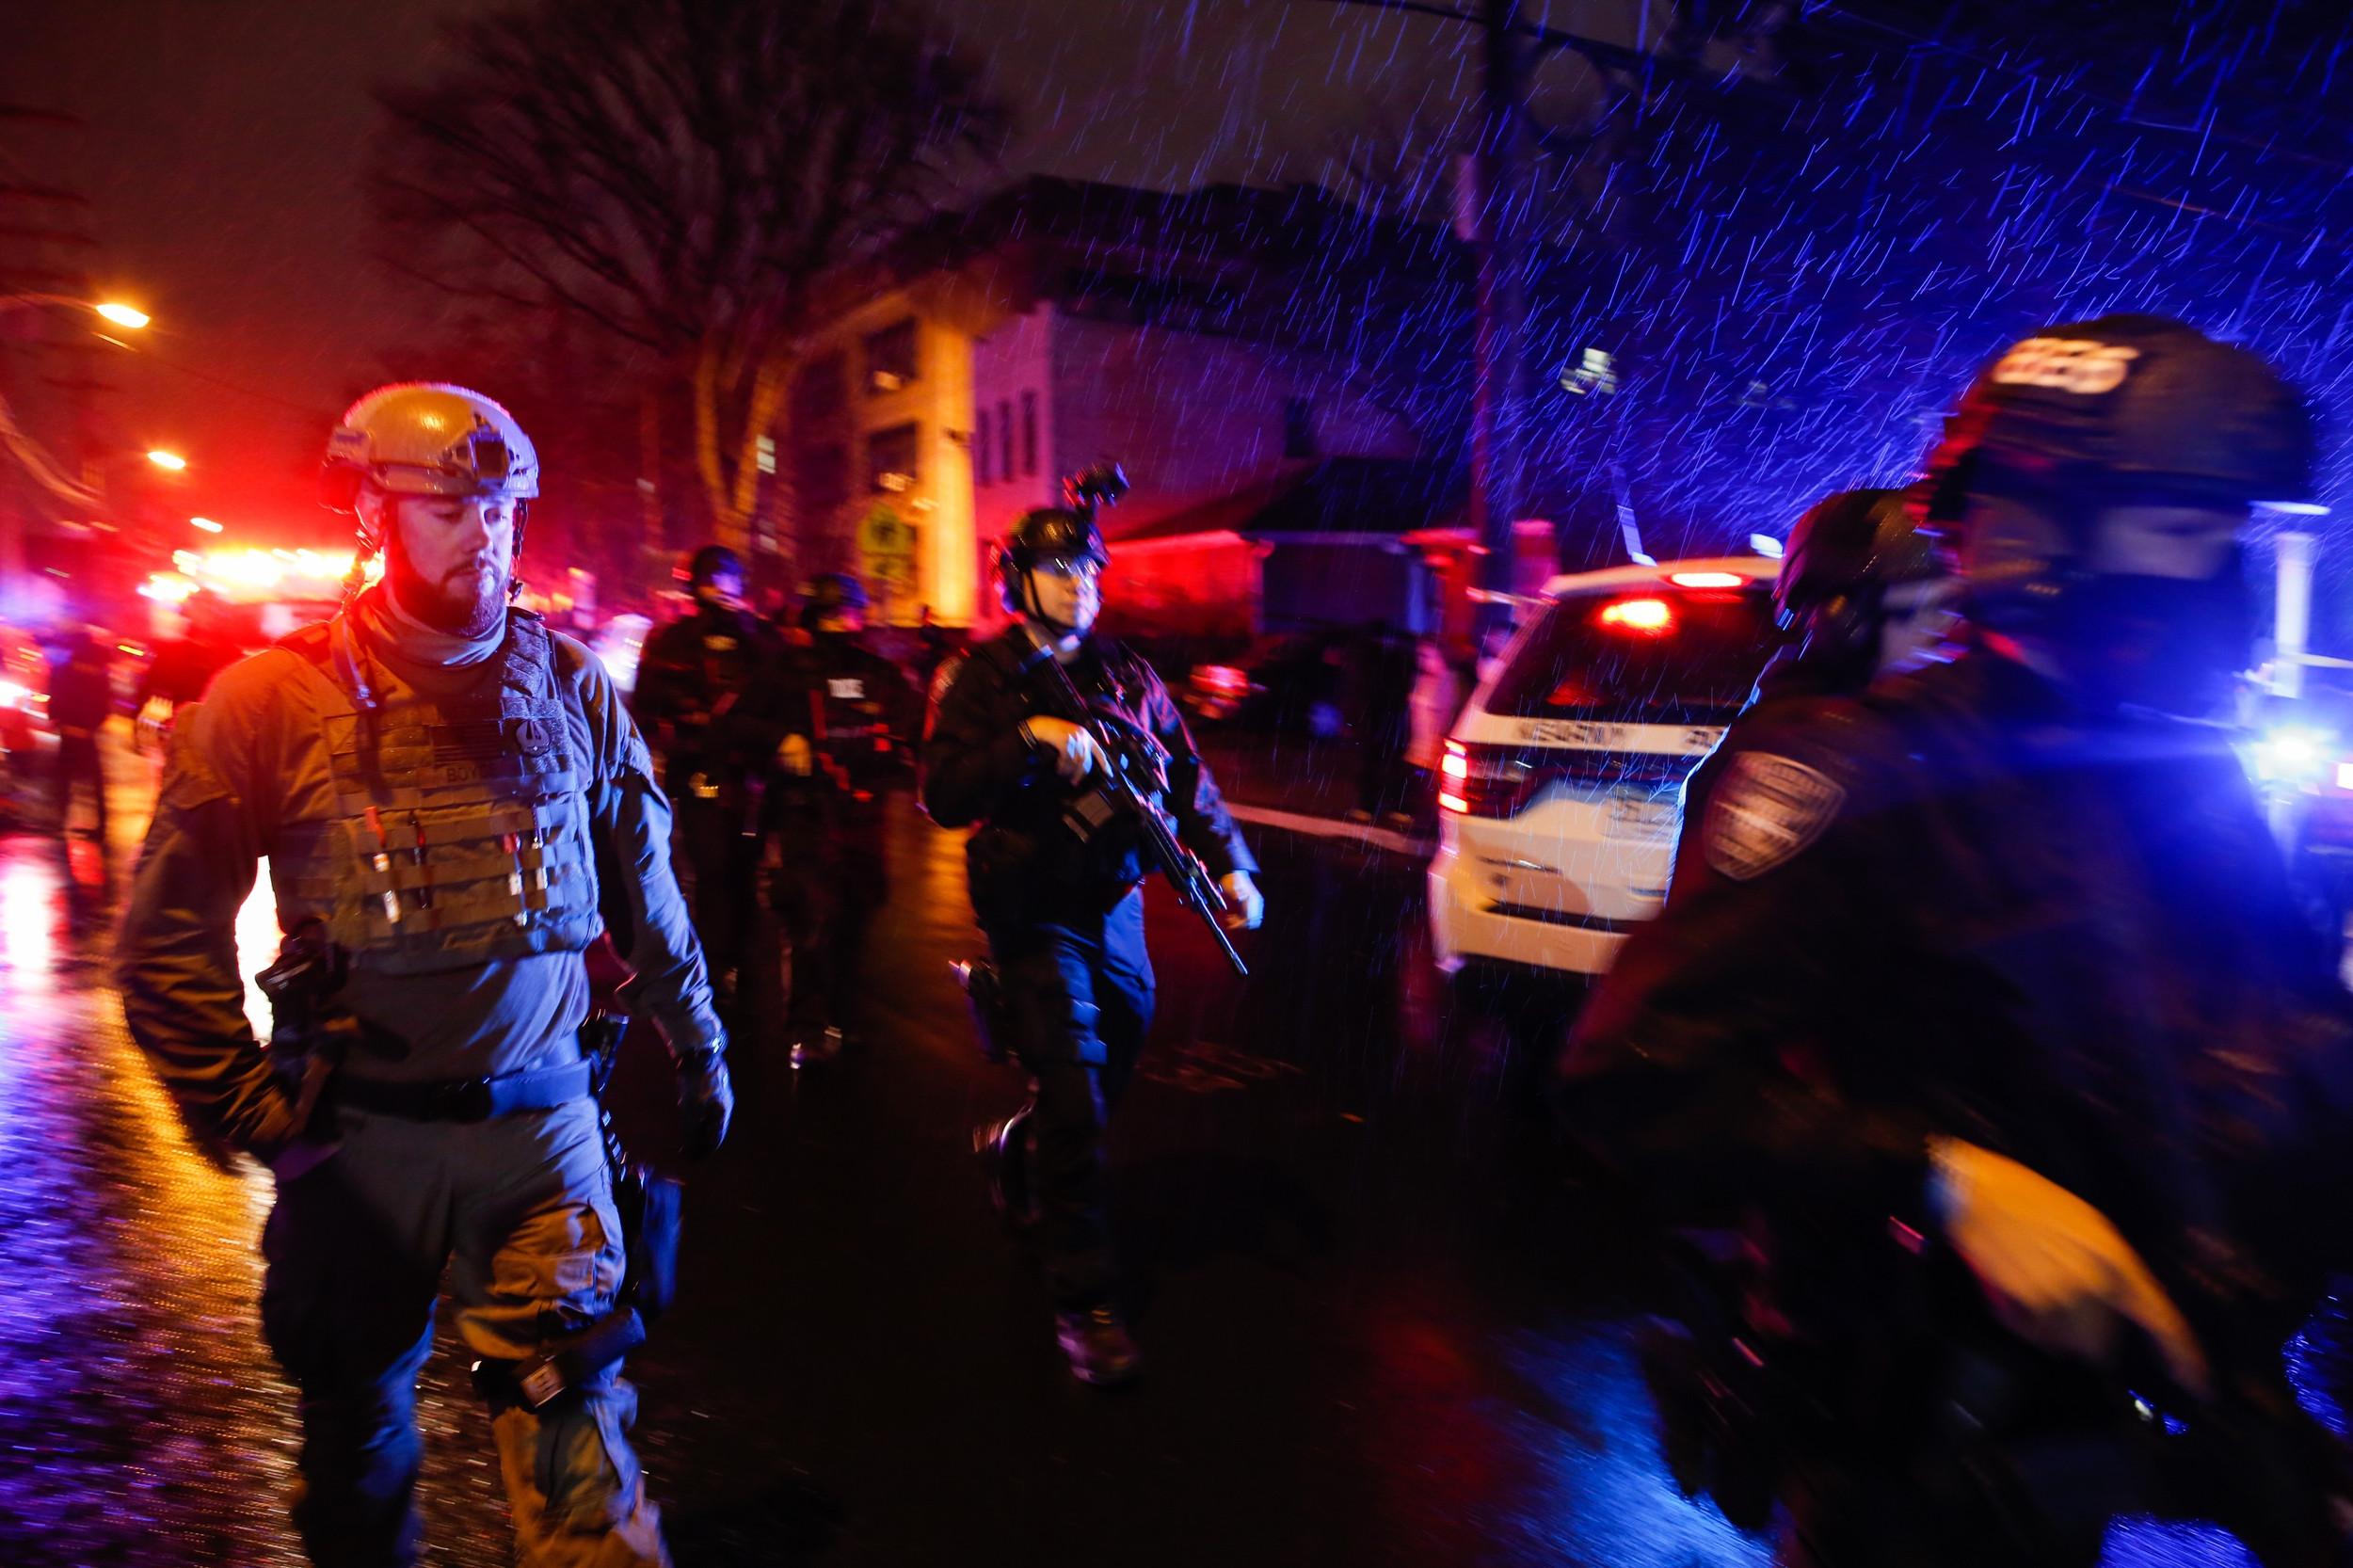 6 Killed in New Jersey Gunbattle, Including Police Officer